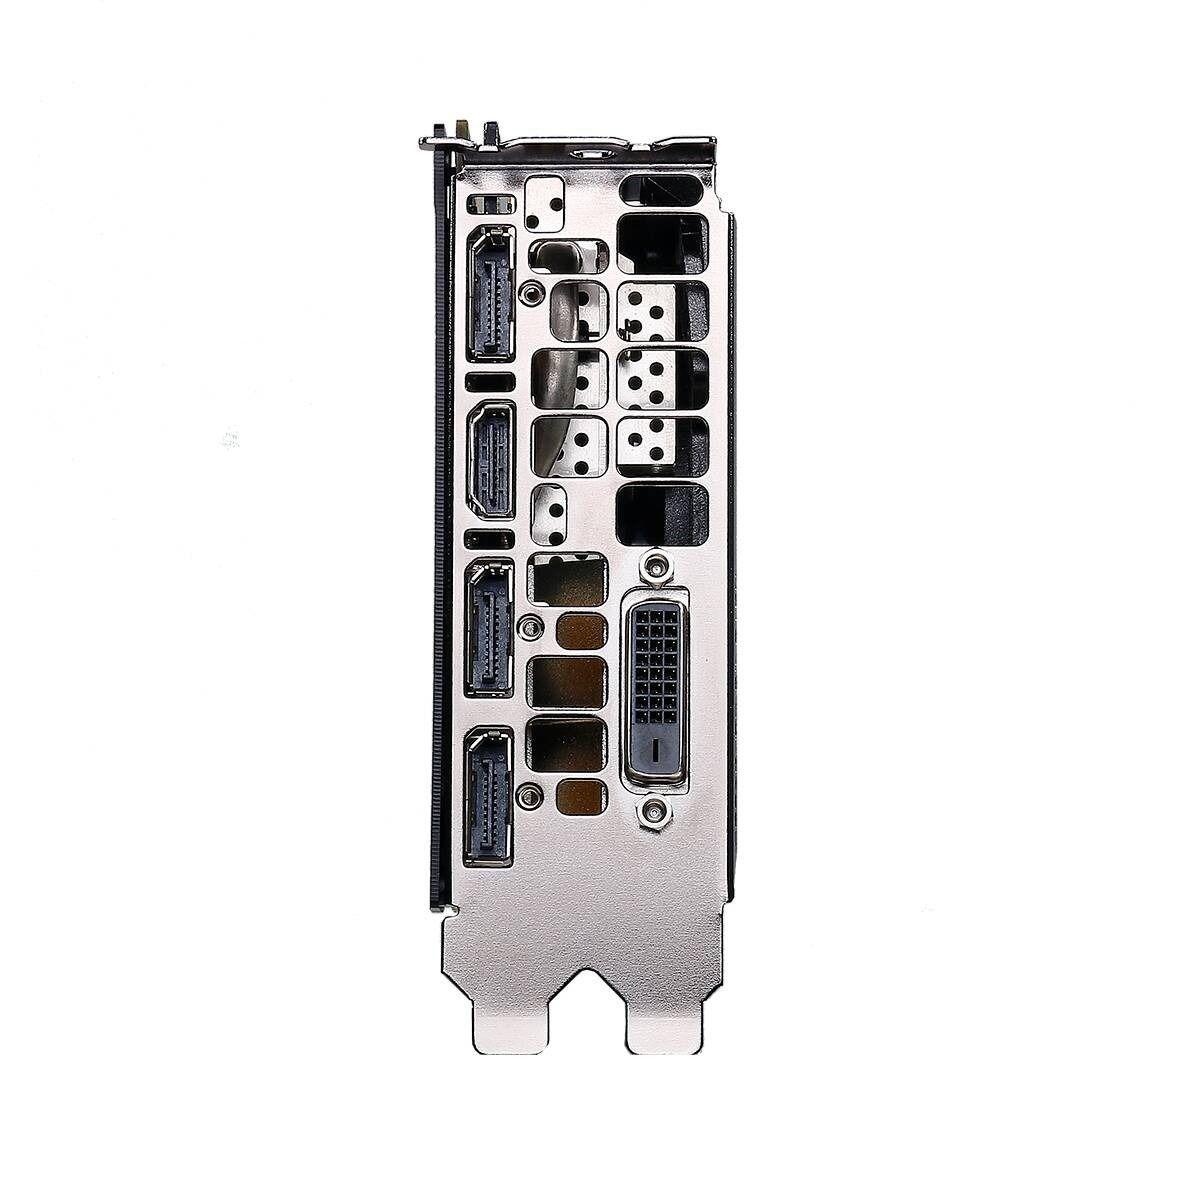 PLACA DE VIDEO EVGA GEFORCE GTX 1080 TI 11GB GDDR5X 352BIT REF ICX, 11G-P4-6591-KR